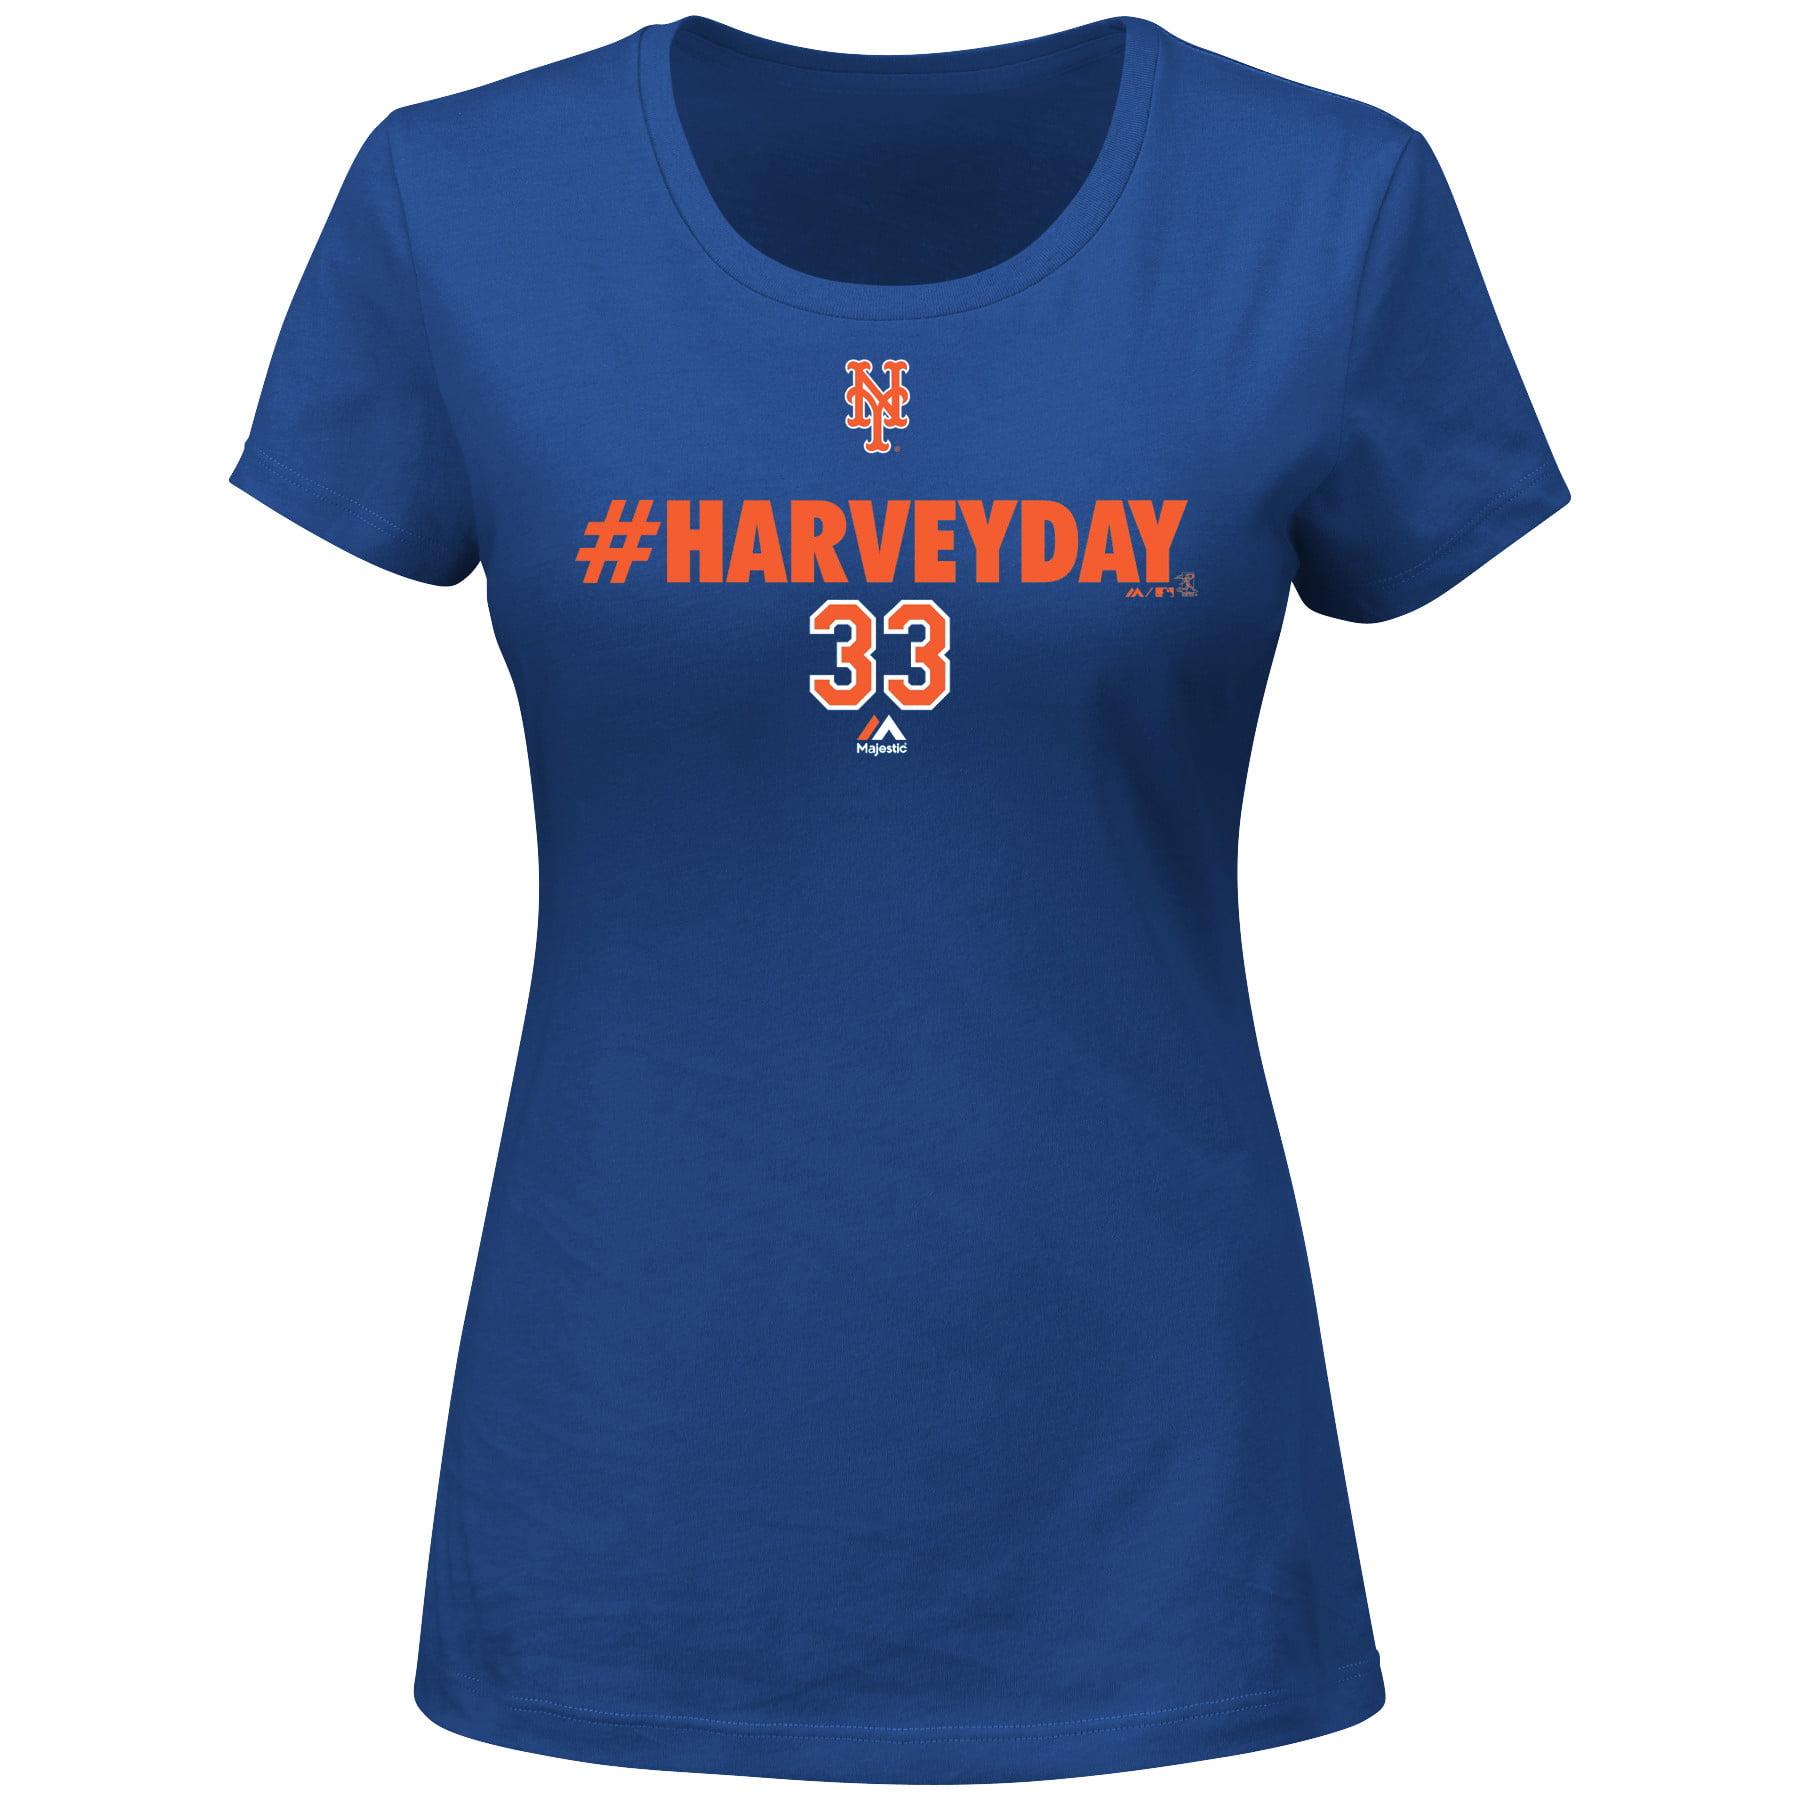 Matt Harvey New York Mets Majestic Women's Harvey Day T-Shirt - Royal